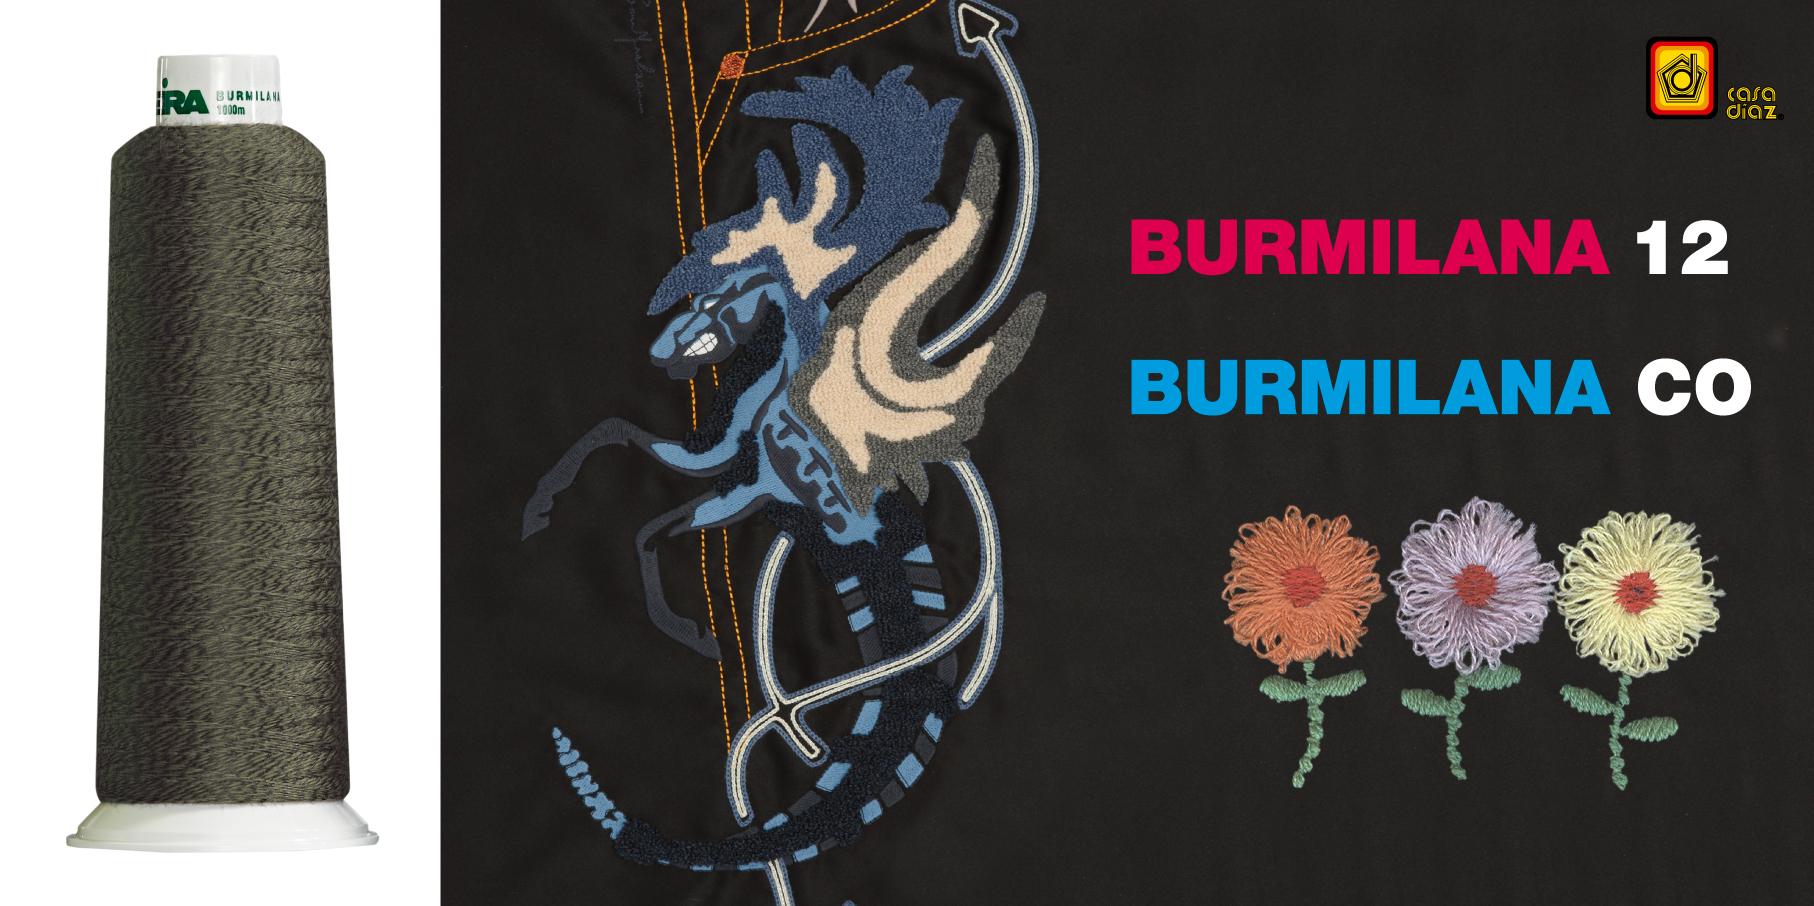 Hilo Burmilana